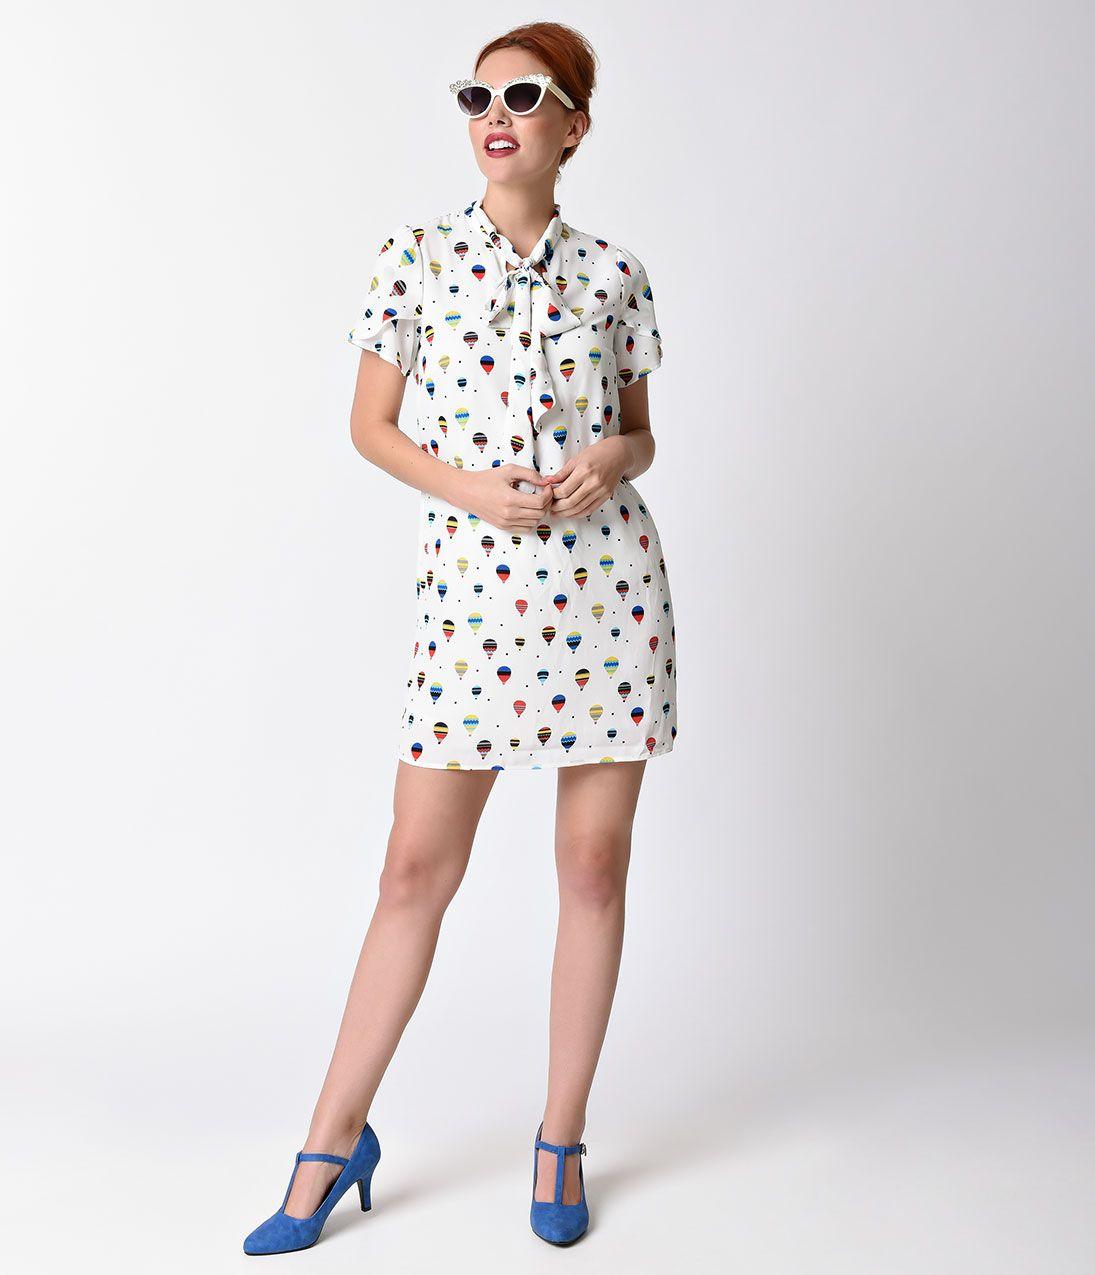 60s Dresses 1960s Dresses Mod Mini Hippie Retro Inspired Fashion Affordable Dresses Casual 1960s Style Dress [ 1275 x 1095 Pixel ]